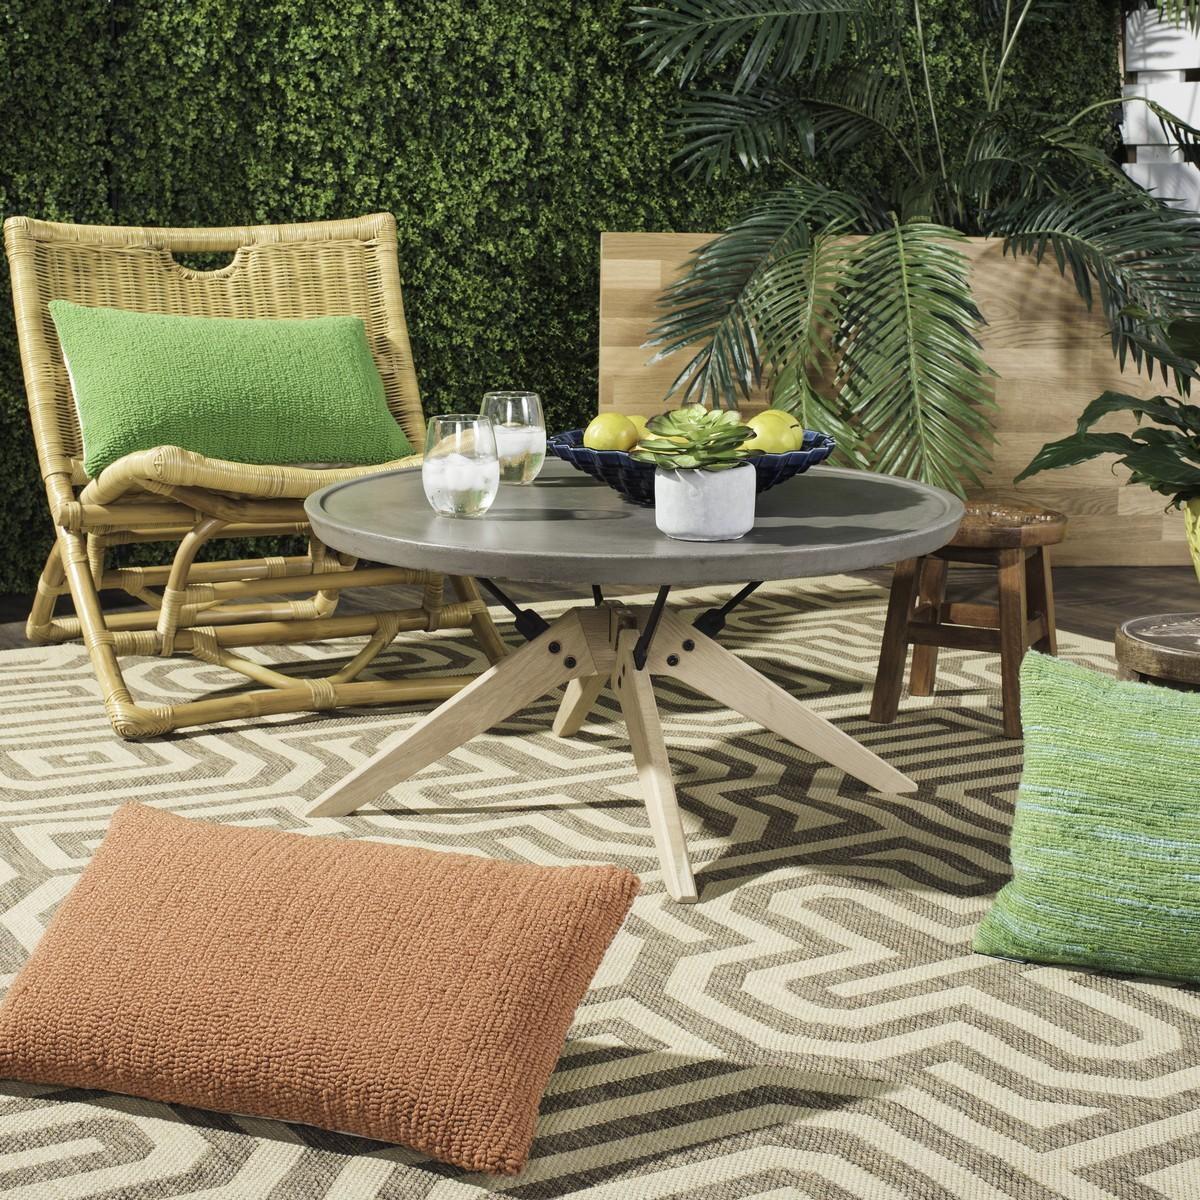 VNN1026A Patio Tables - Furniture by Safavieh